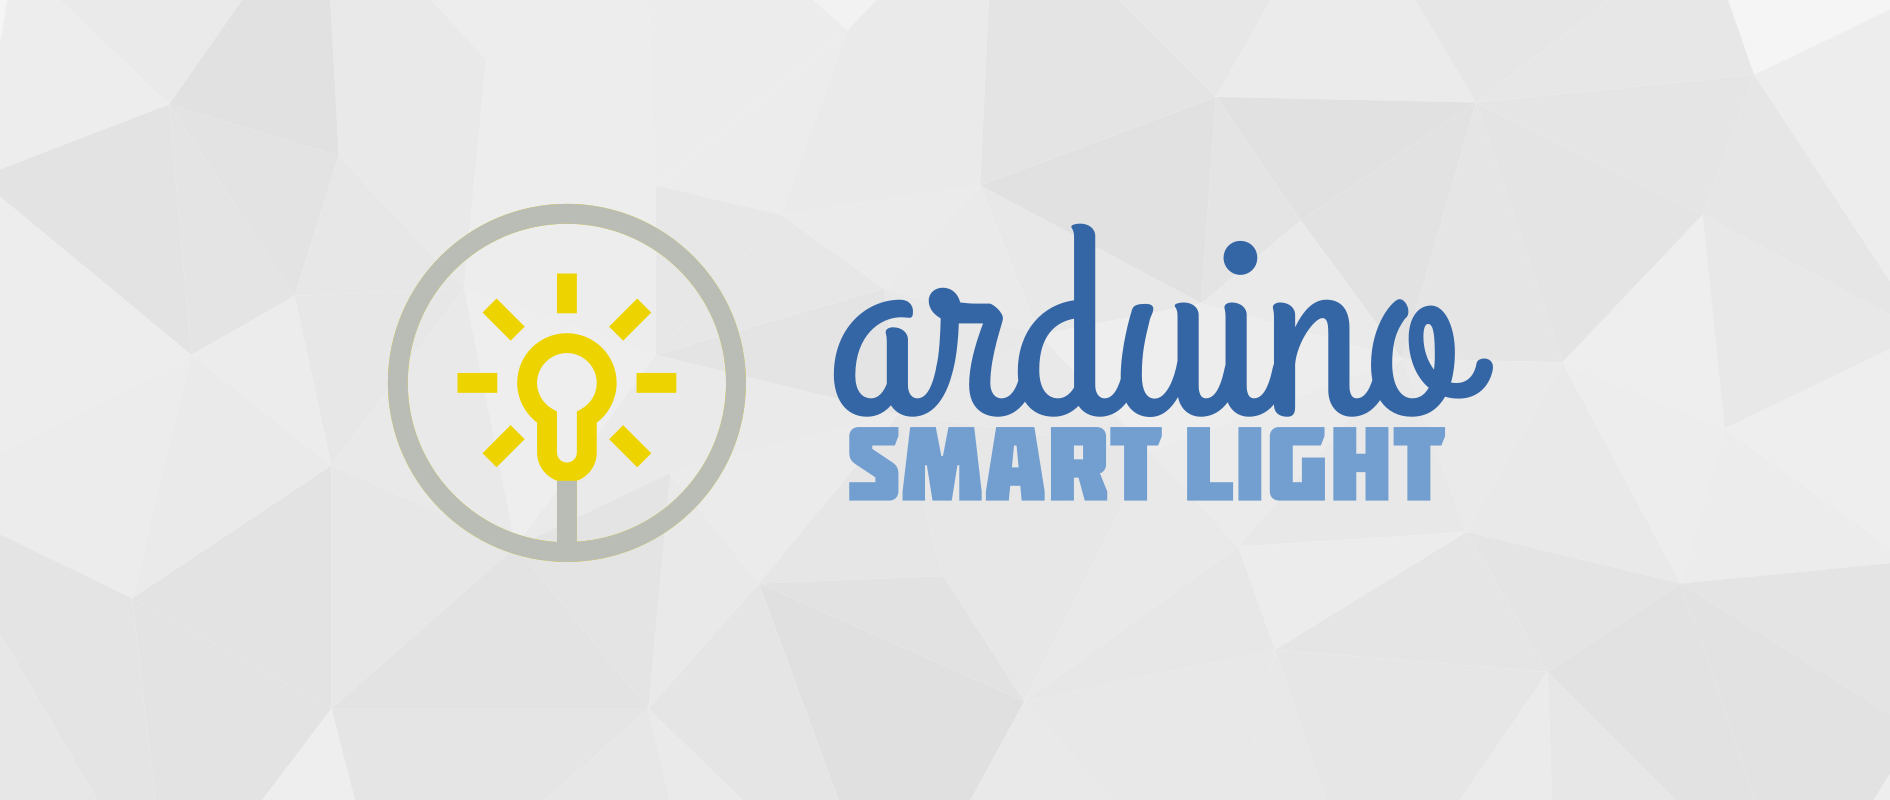 arduino-smart-light